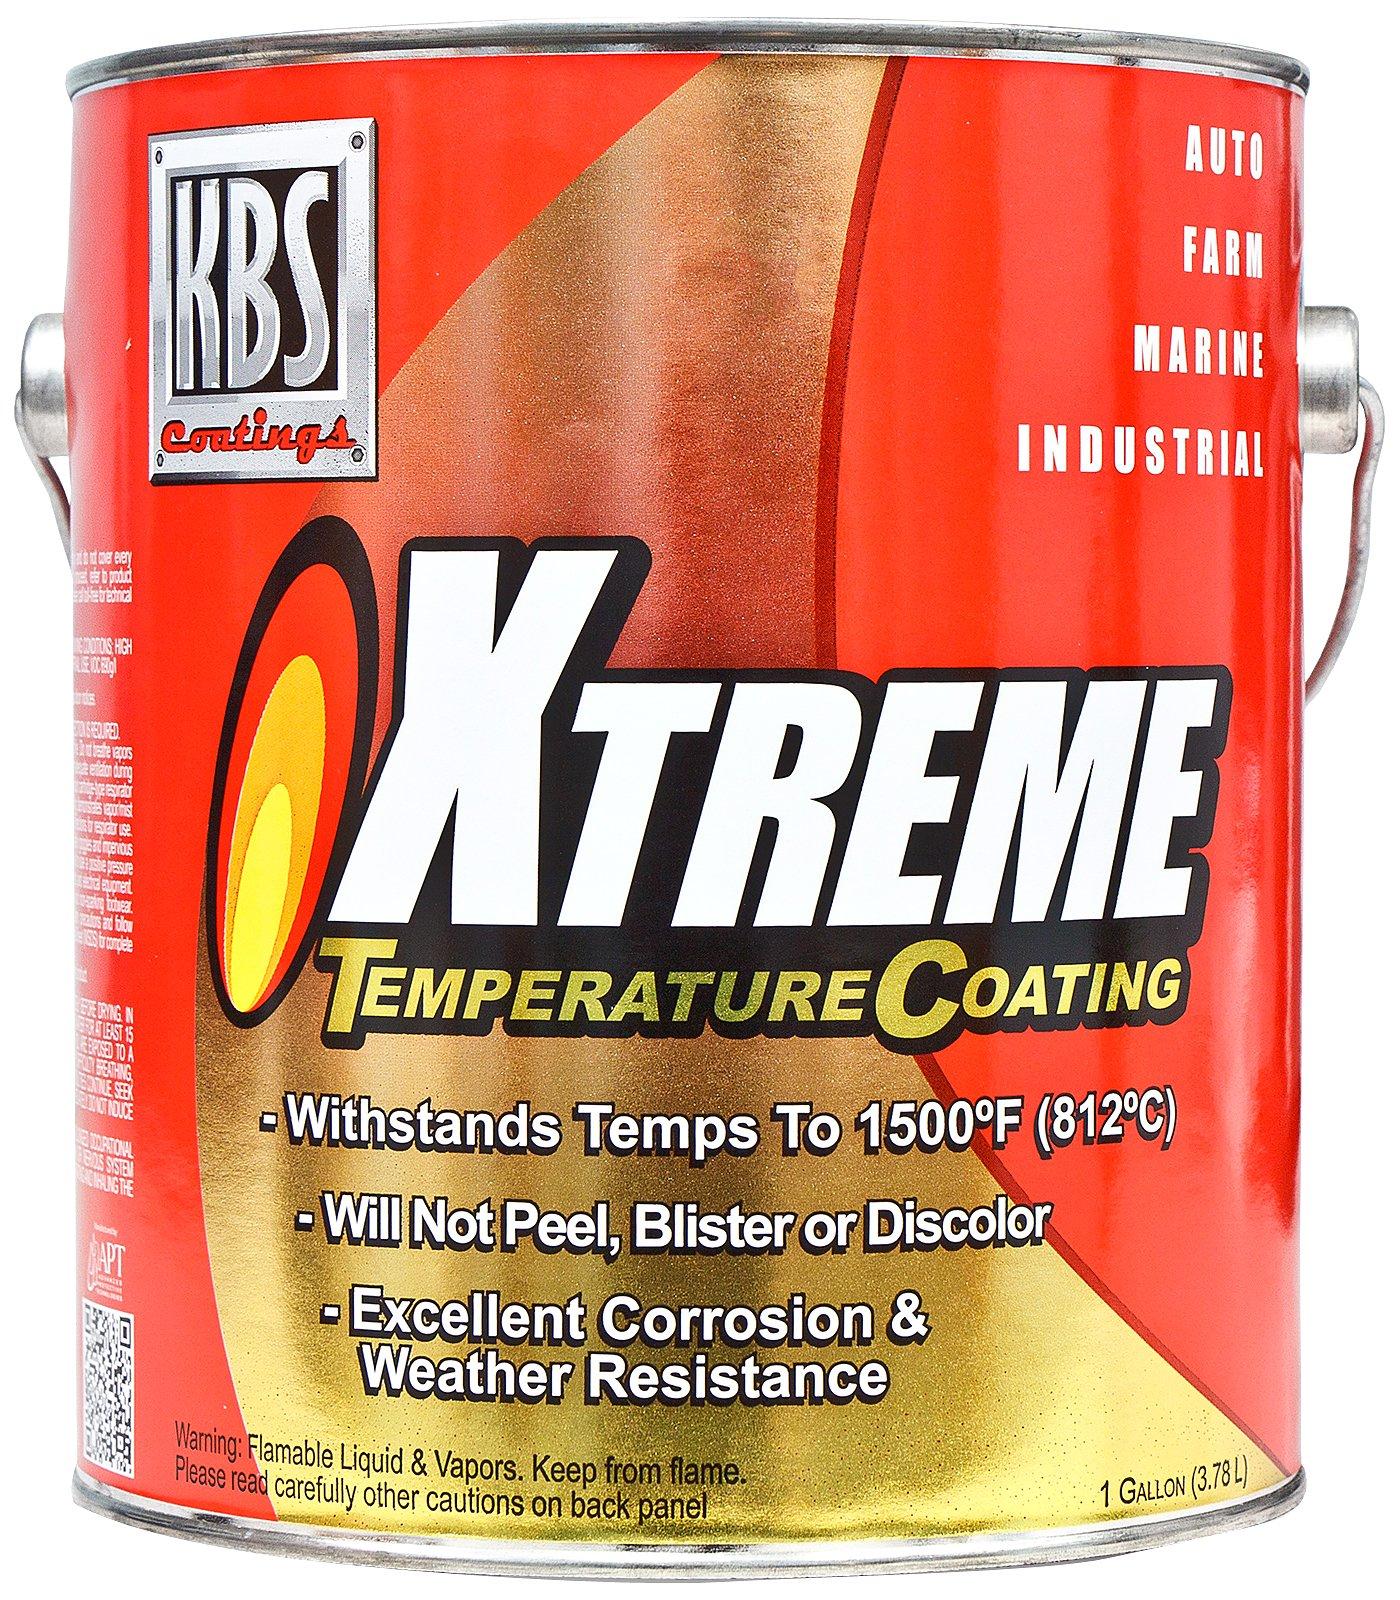 KBS Coatings 65503 Aluminum Xtreme Temperature Coating - 1 Gallon by KBS Coatings